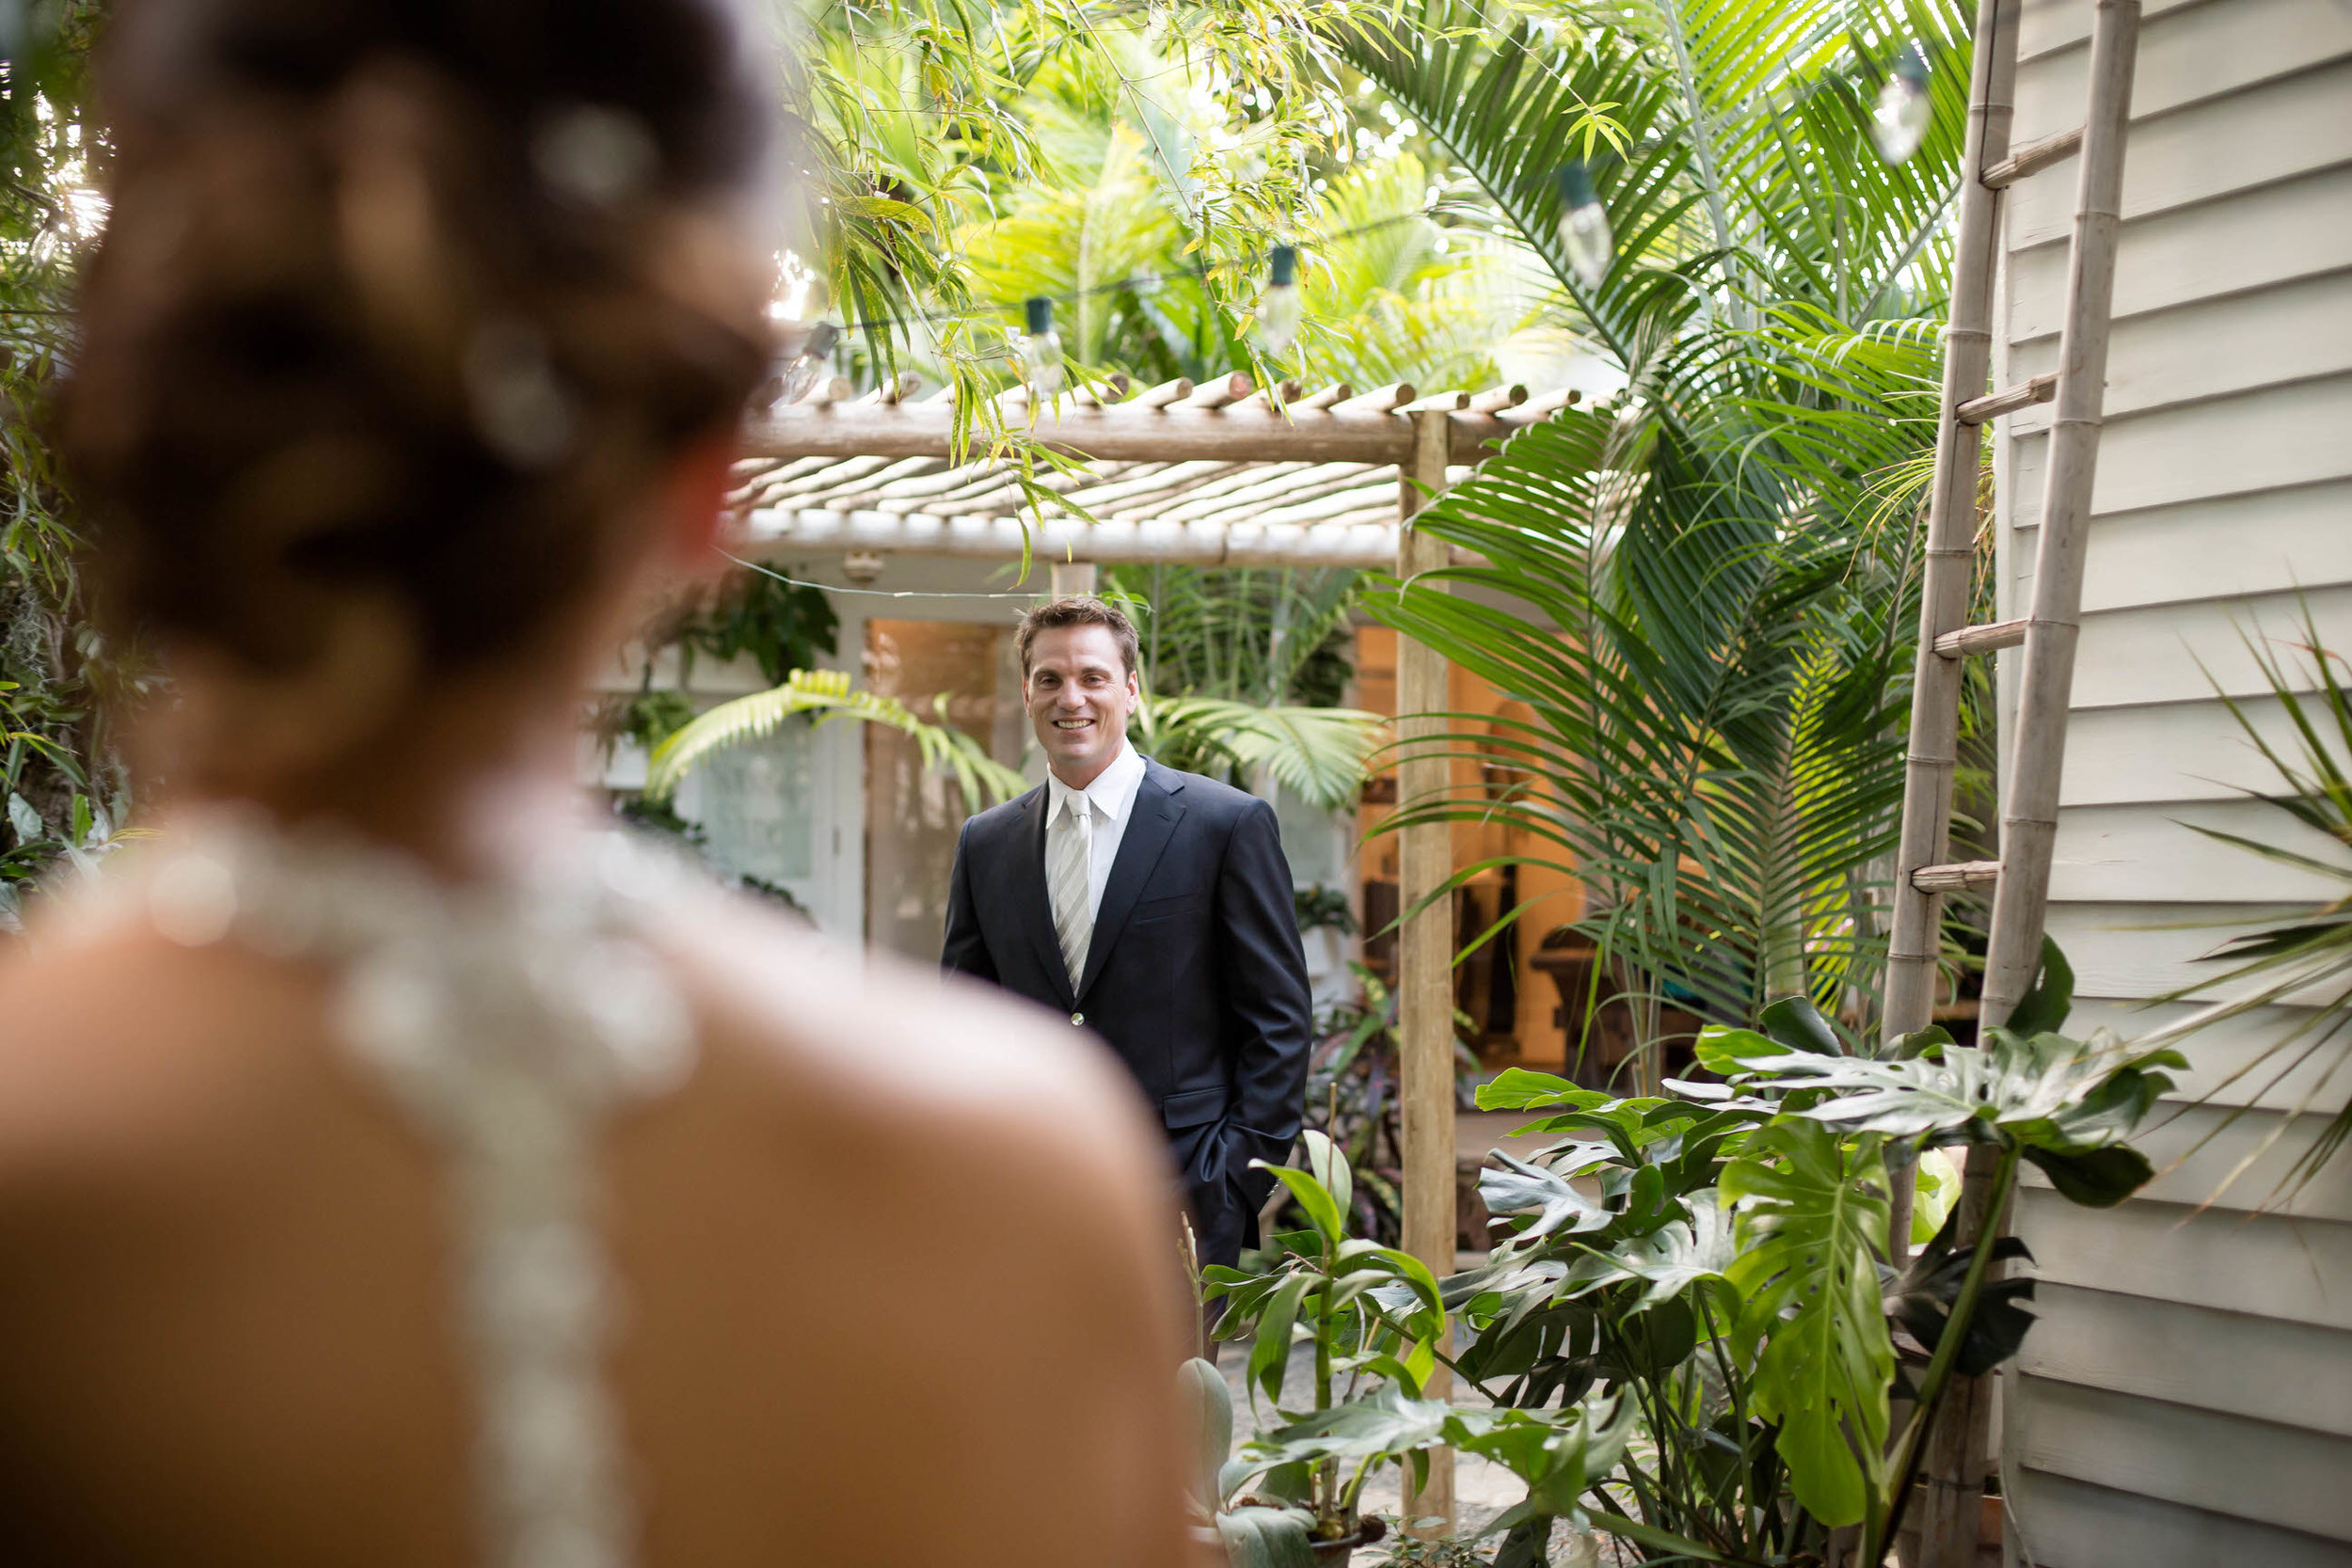 emotional_first_look_bride_groom_Key_West_Tiny_house_photo.jpg